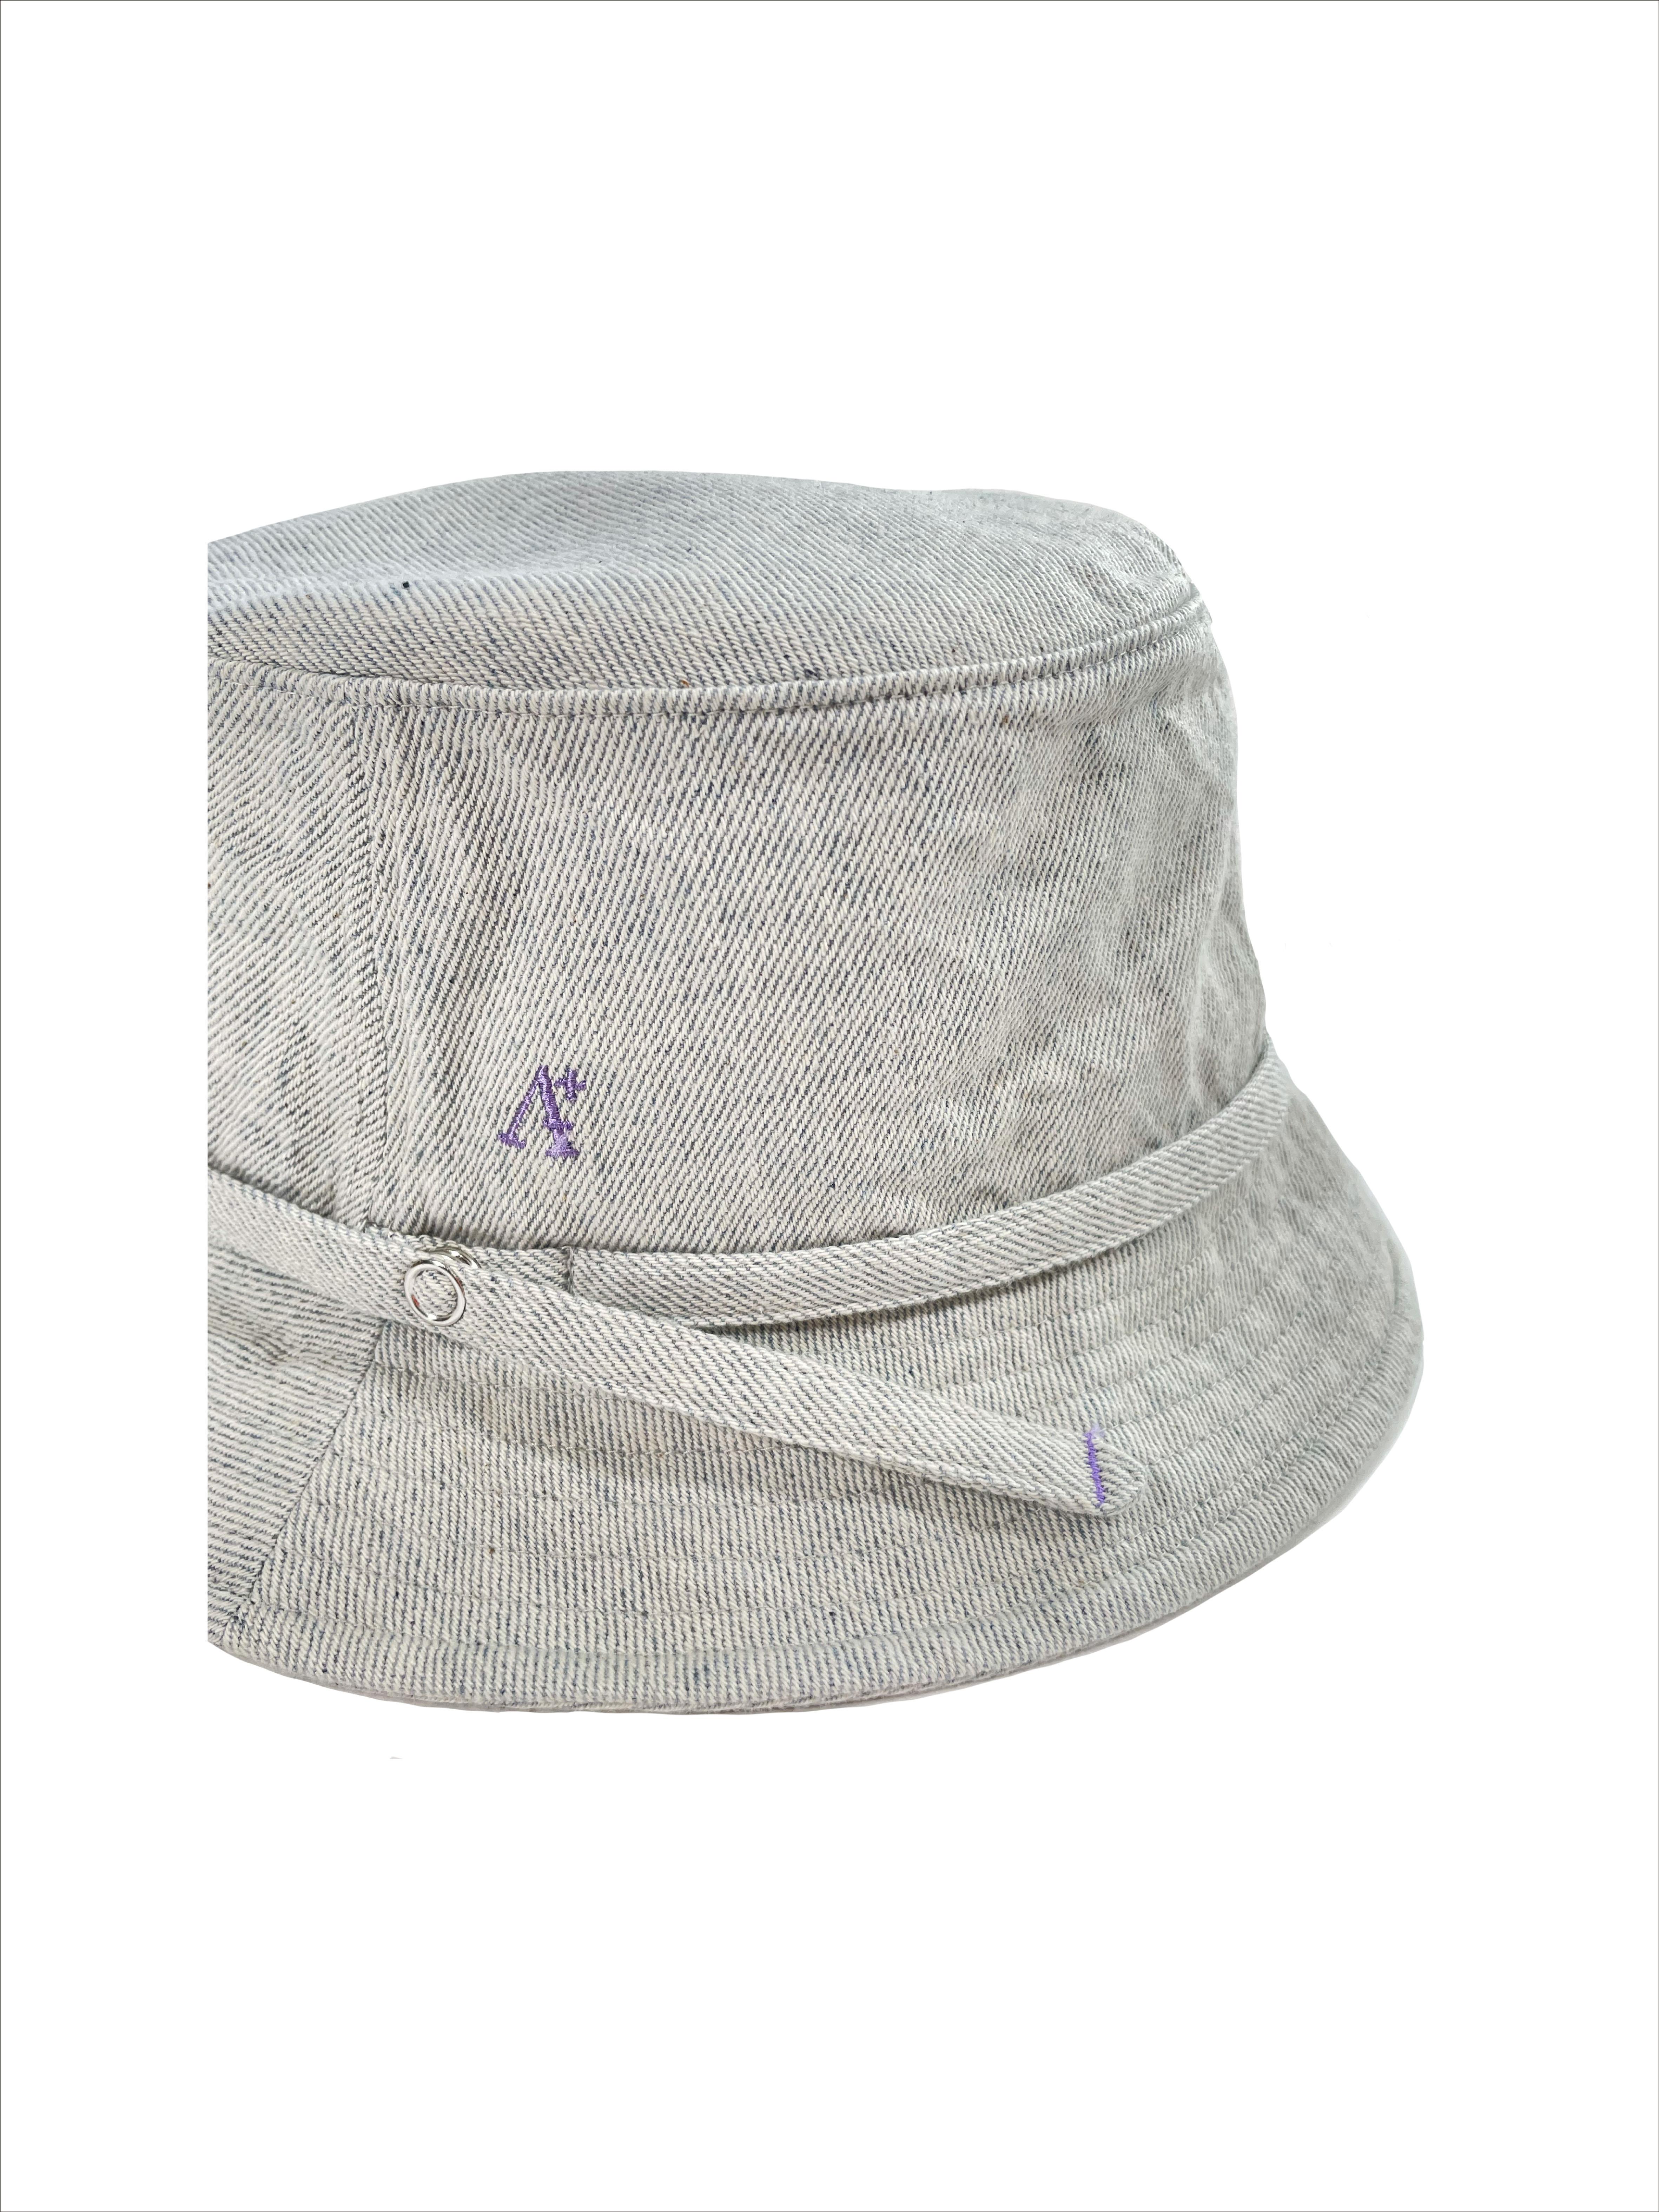 DAILY BUCKET HATのサムネイル2